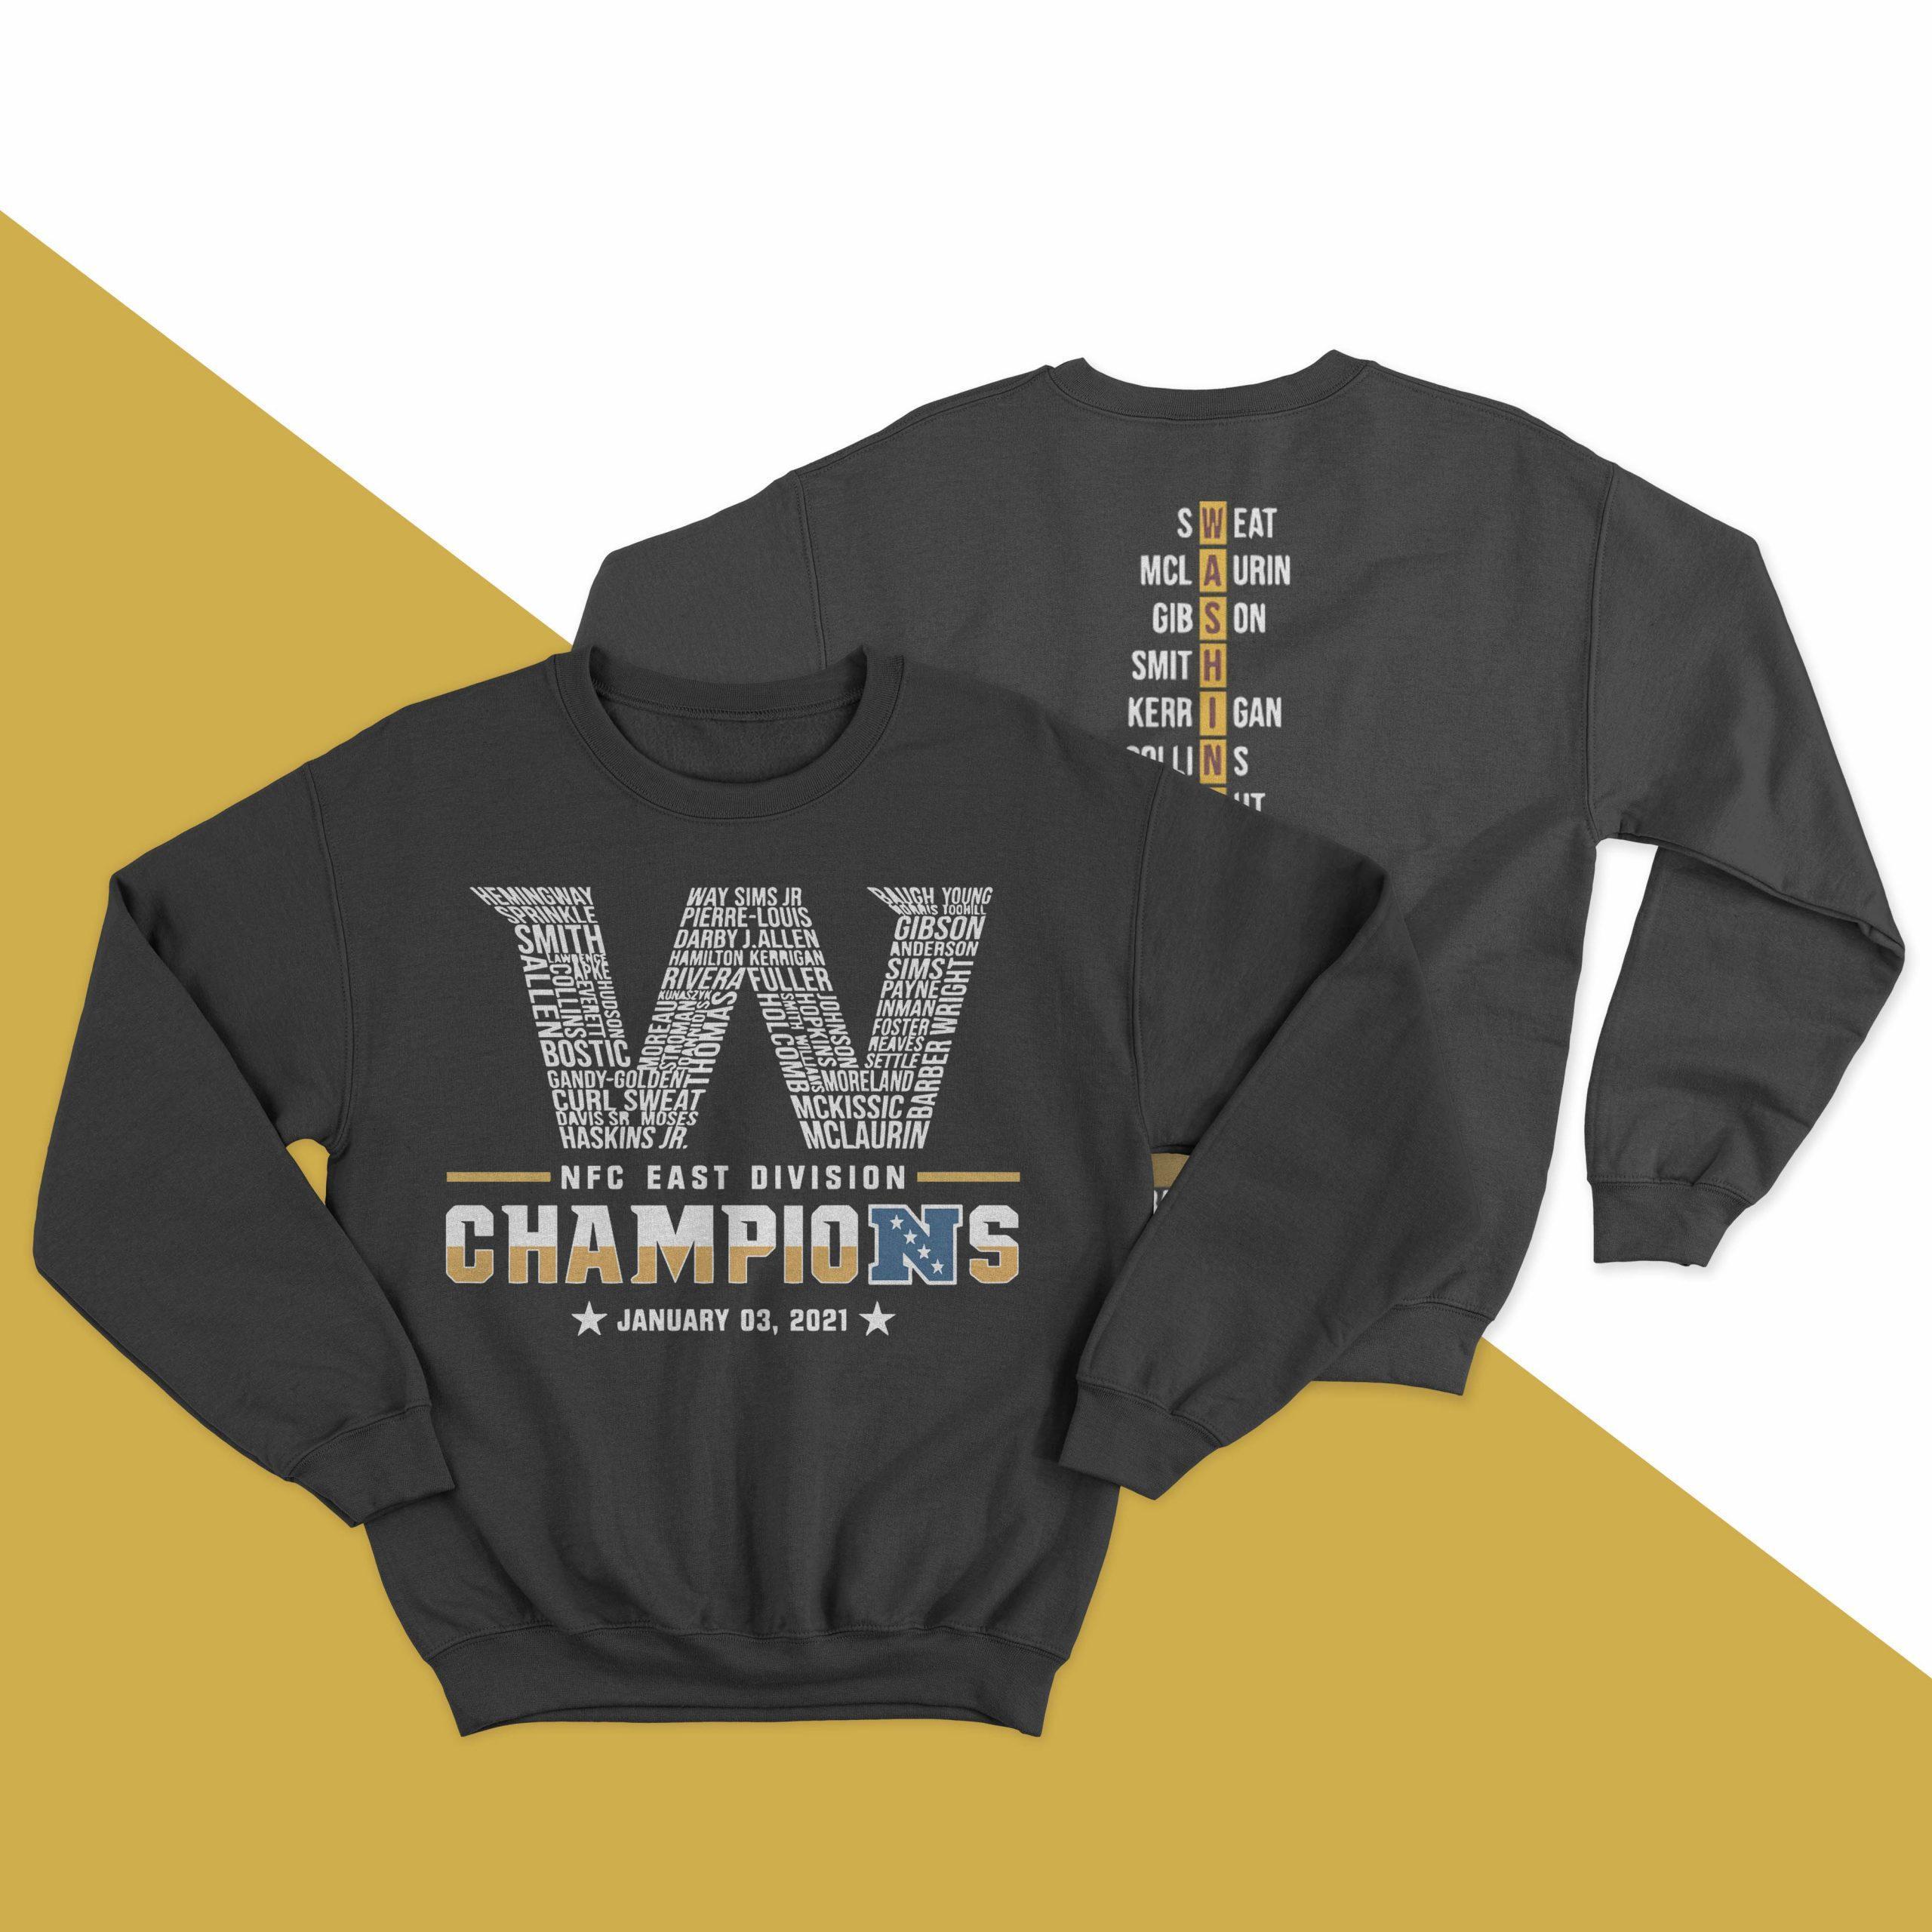 Washington Nfc East Division Champions January 03 2021 Longsleeve